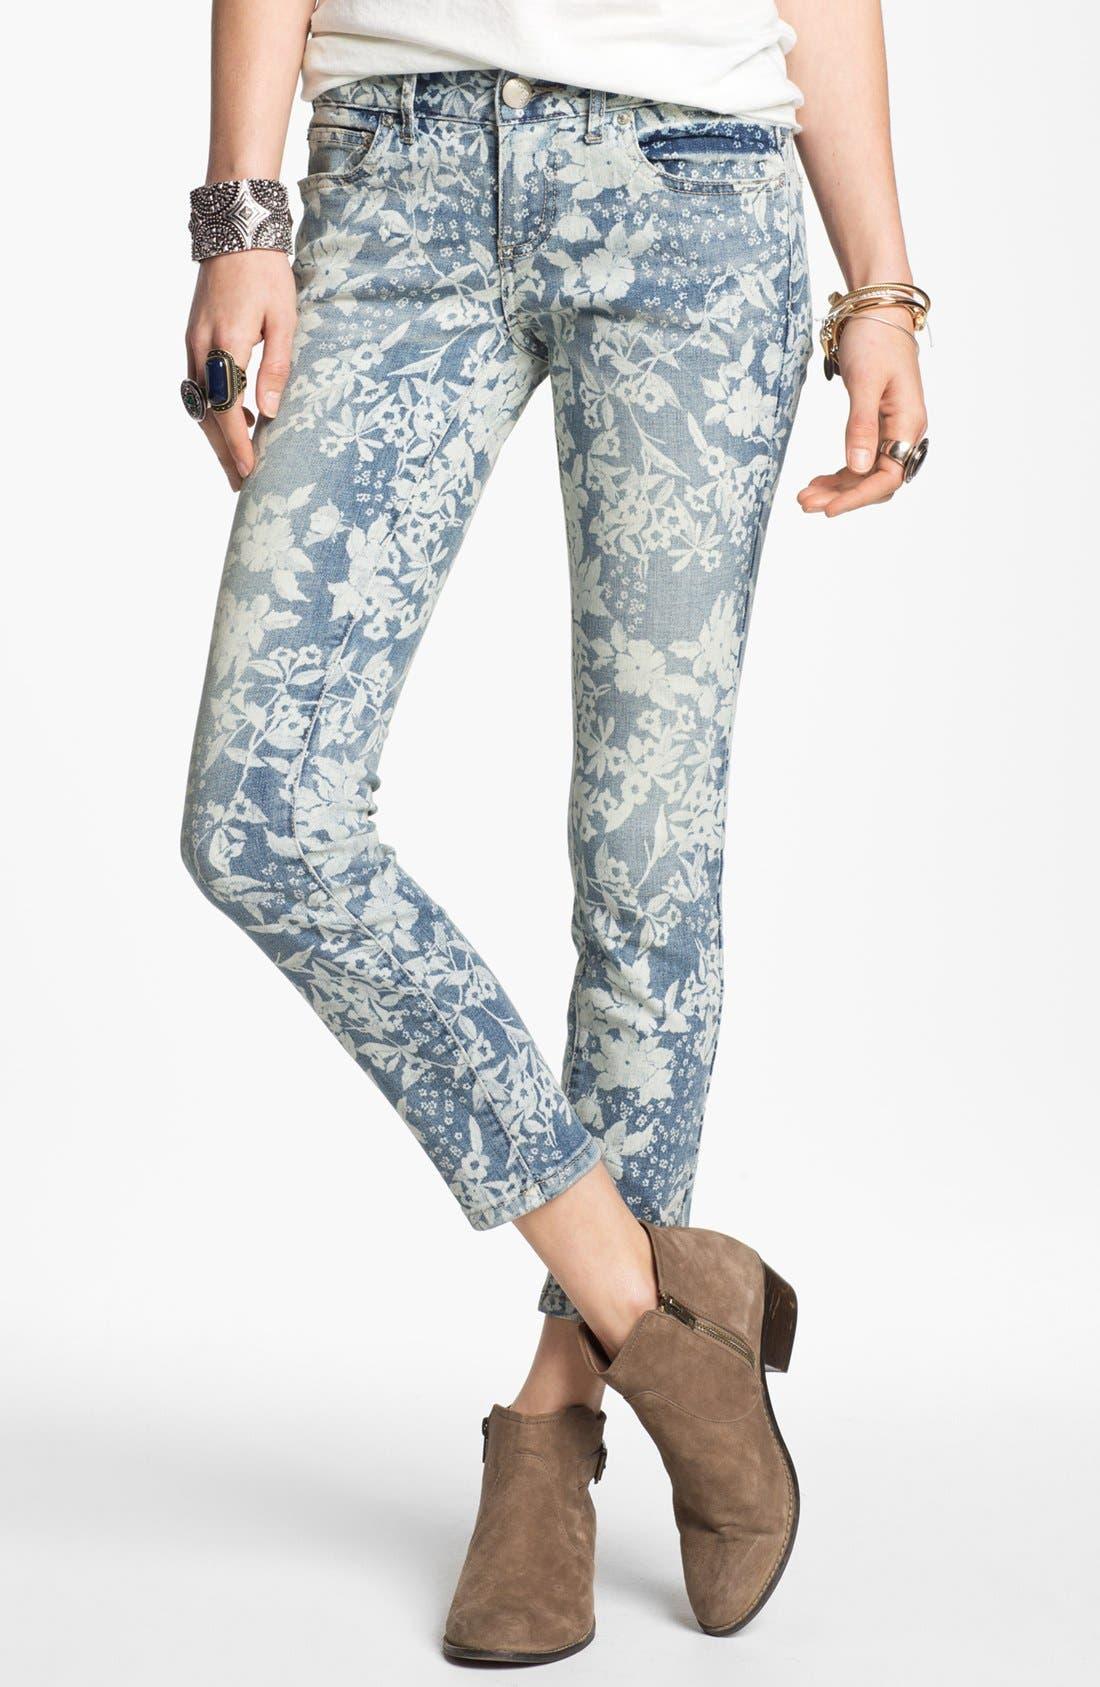 Alternate Image 1 Selected - Free People Hawaiian Print Crop Skinny Jeans (Denim Combo)